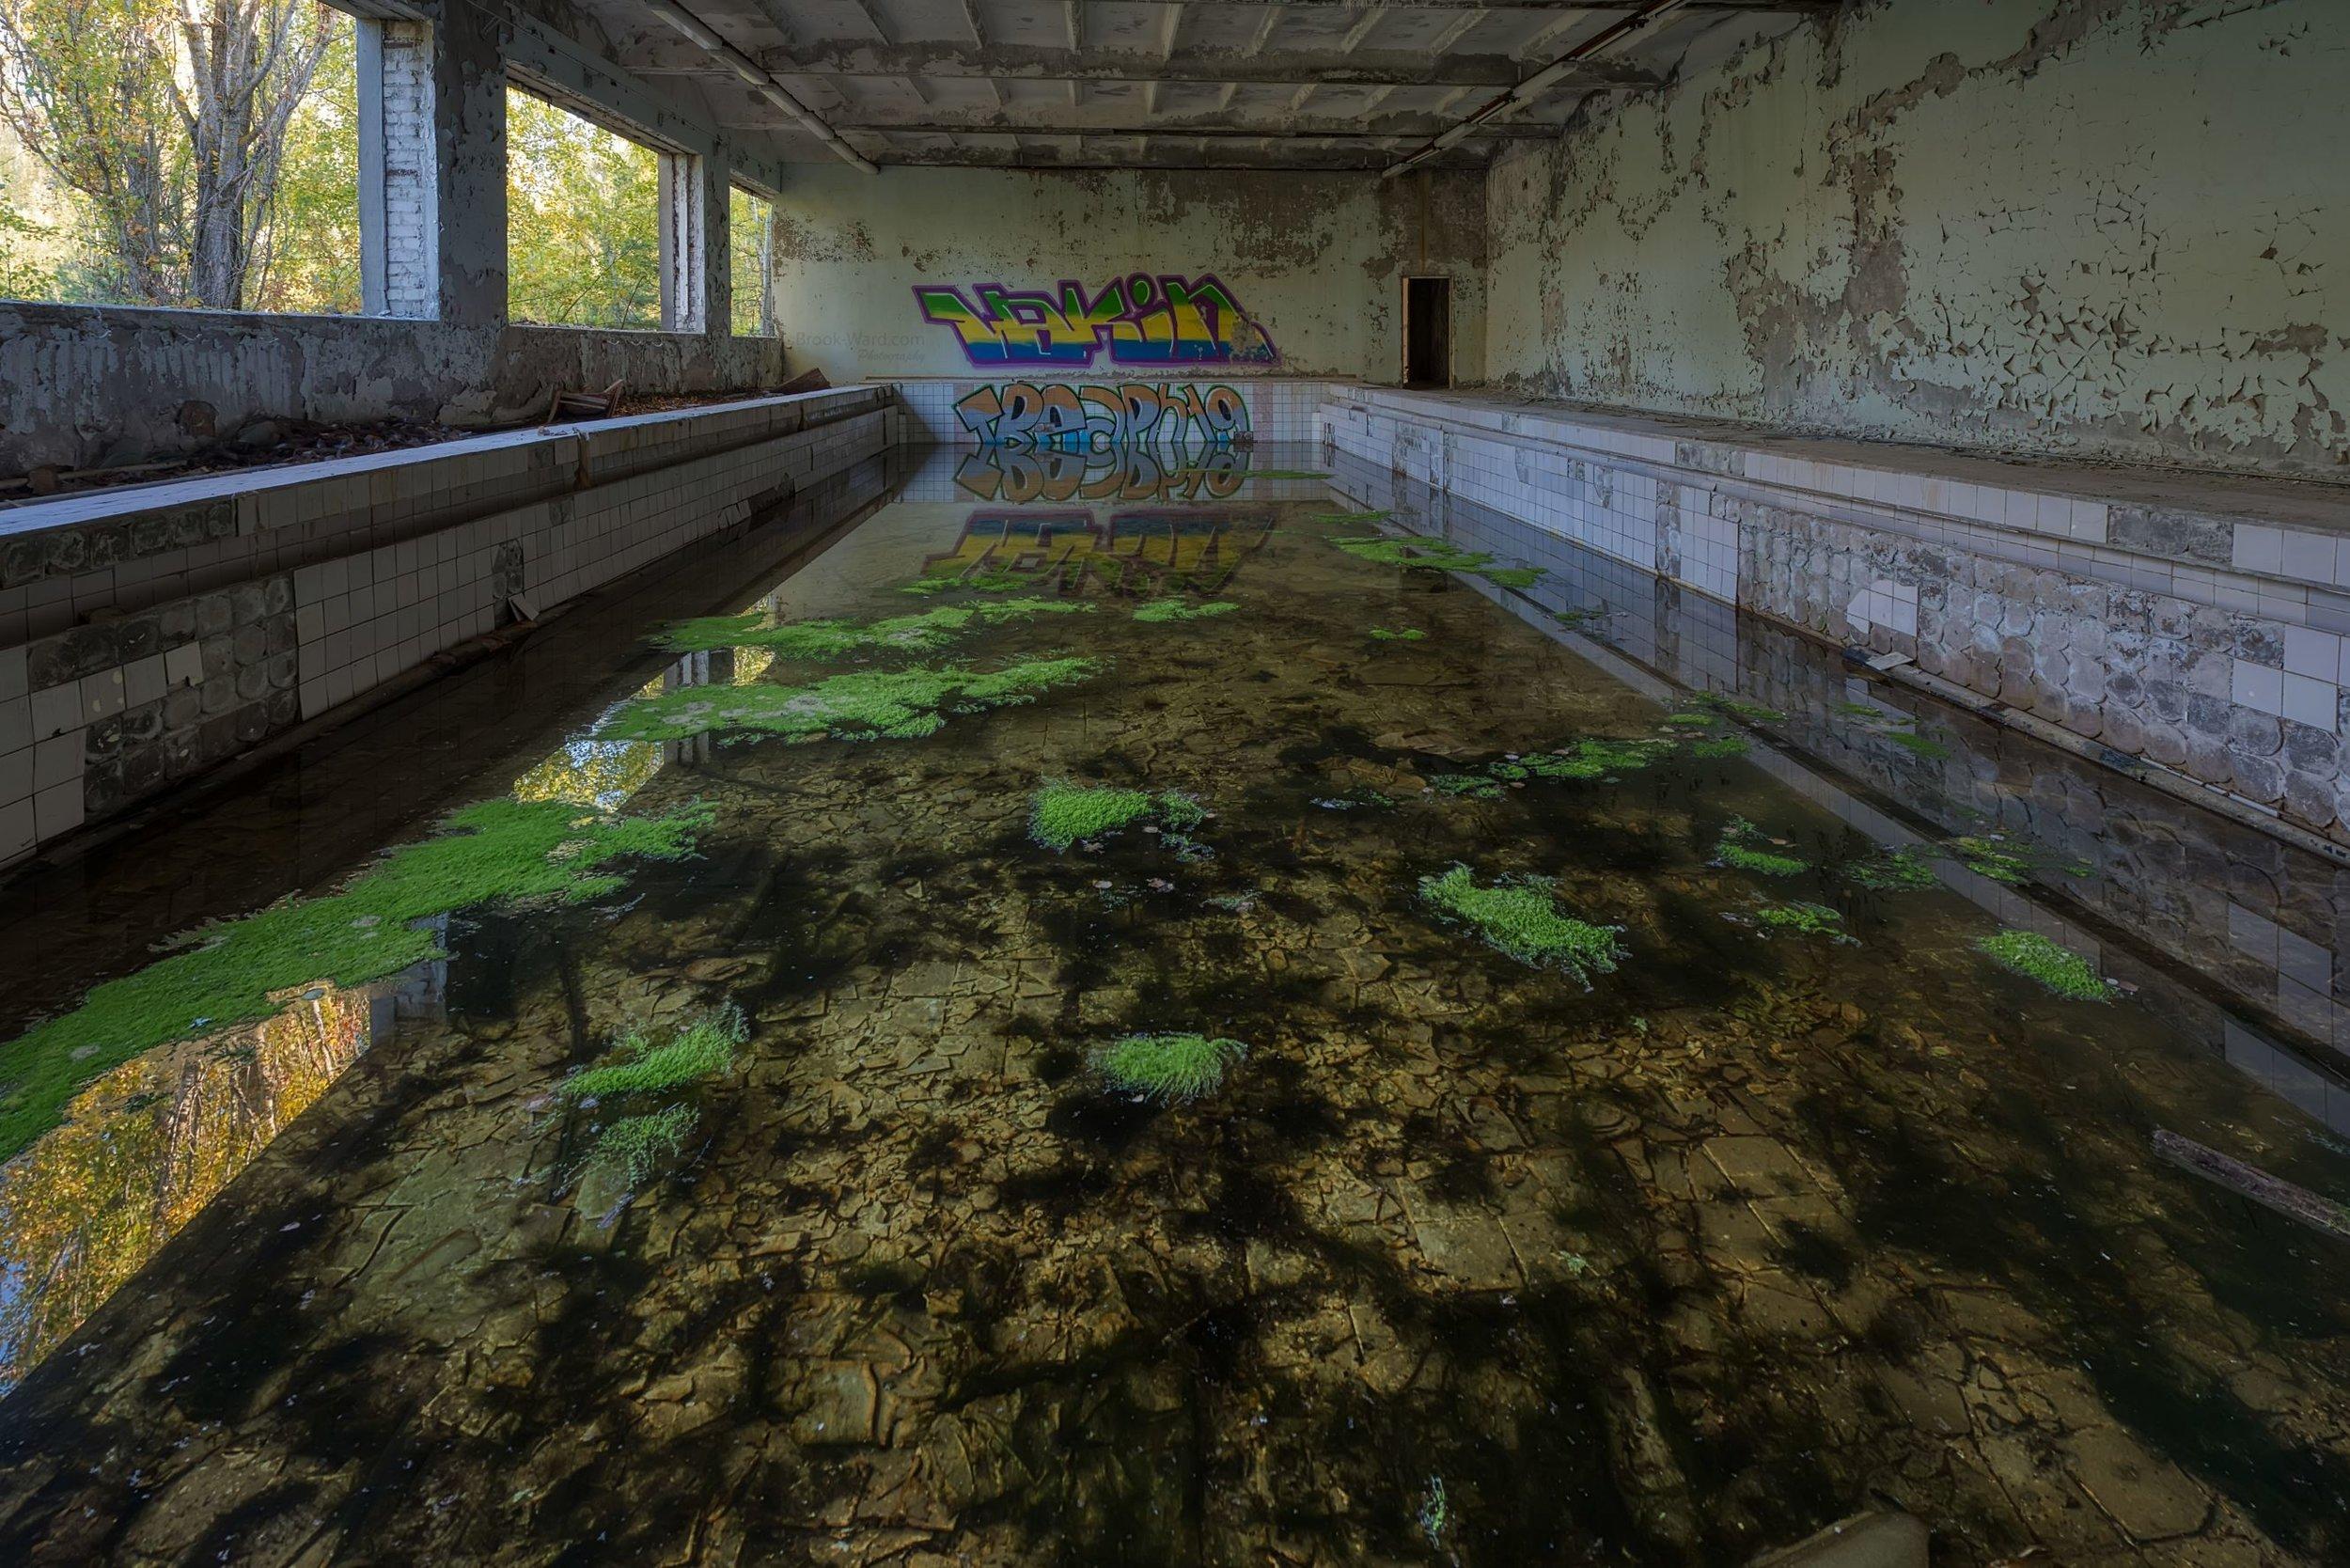 Chernobyl Cultural Center Pool